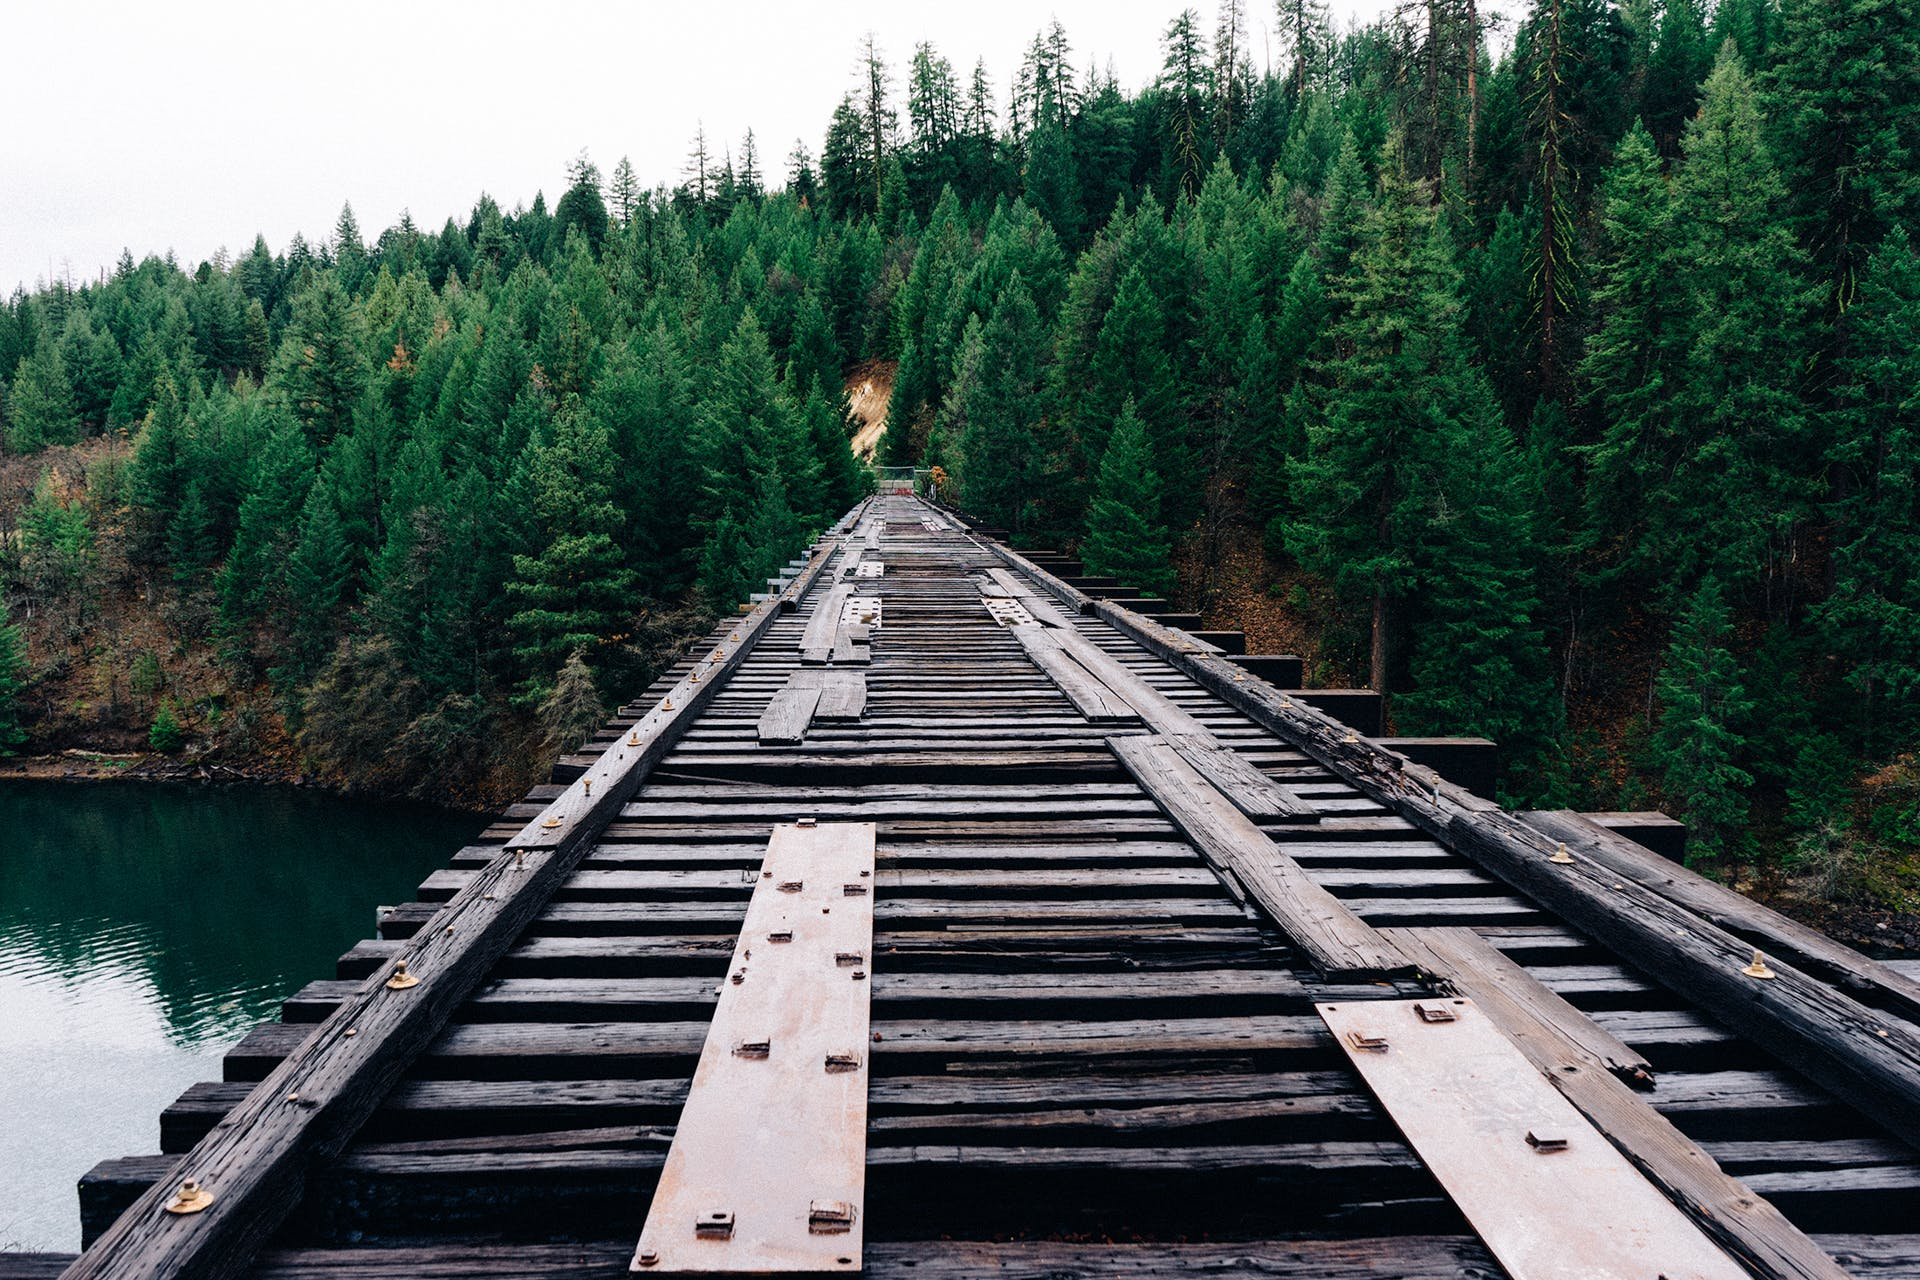 Brown Wooden Train Railway